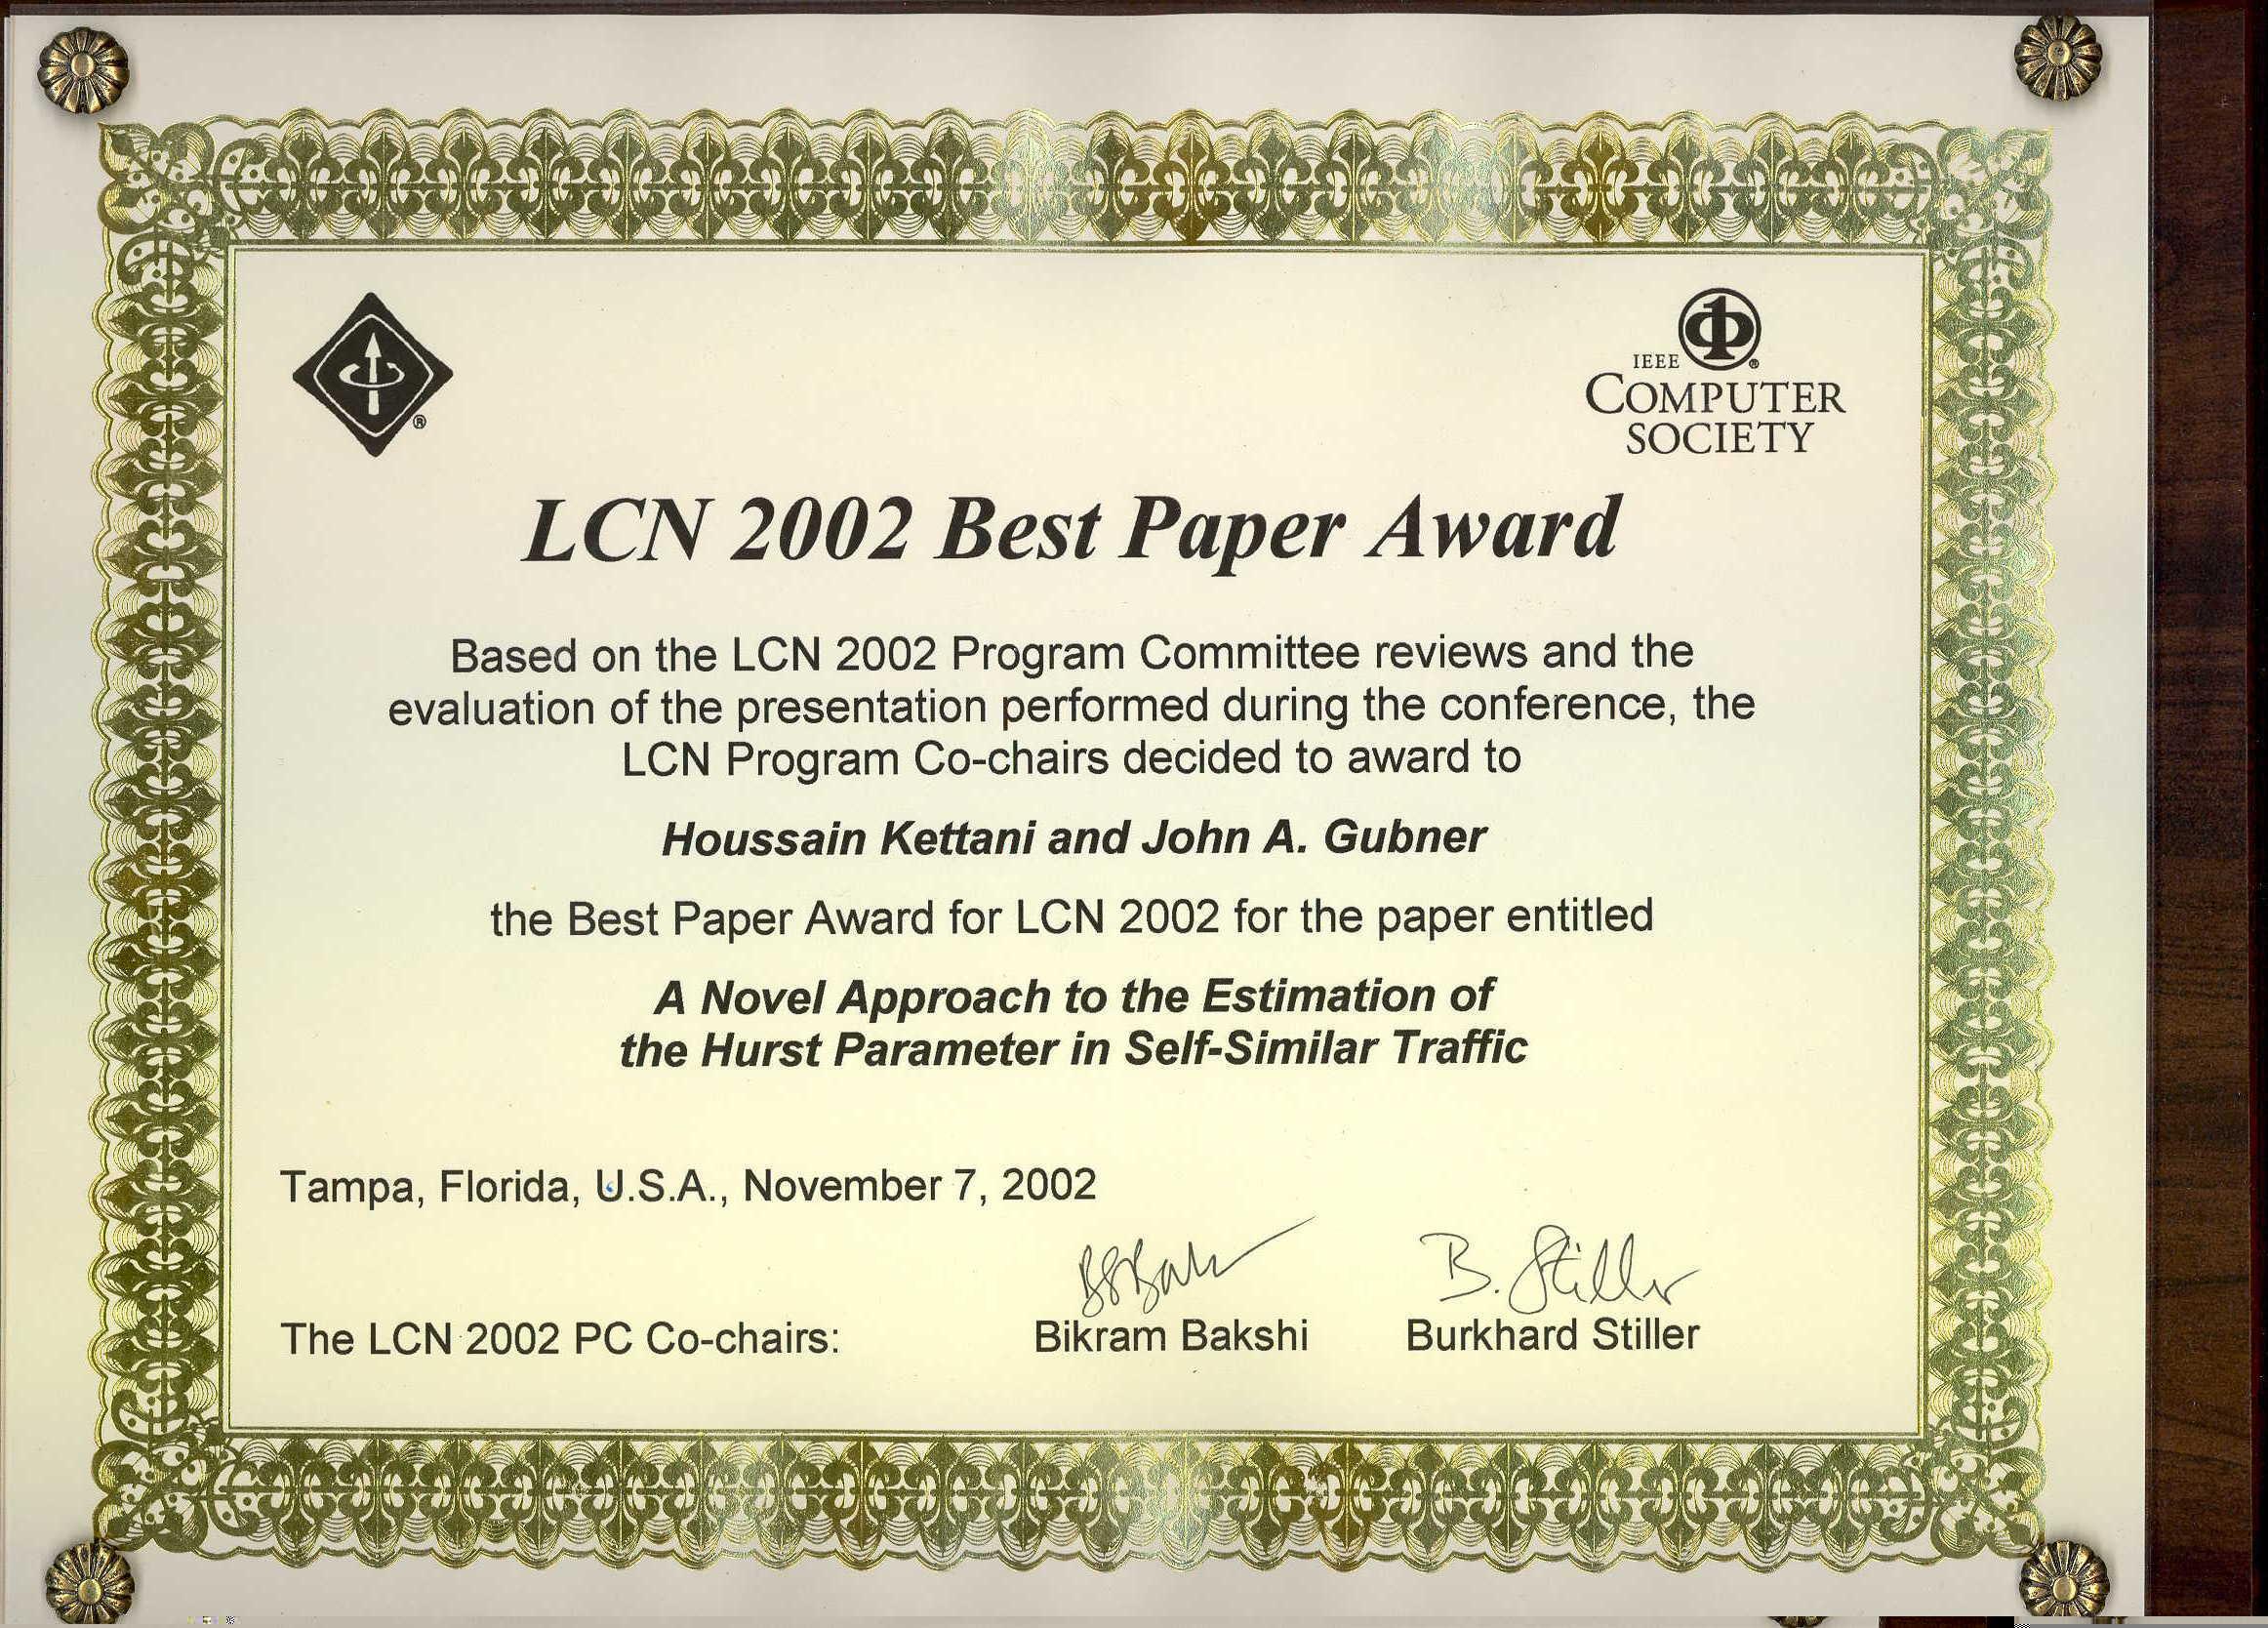 LCN '02 Best Paper Award